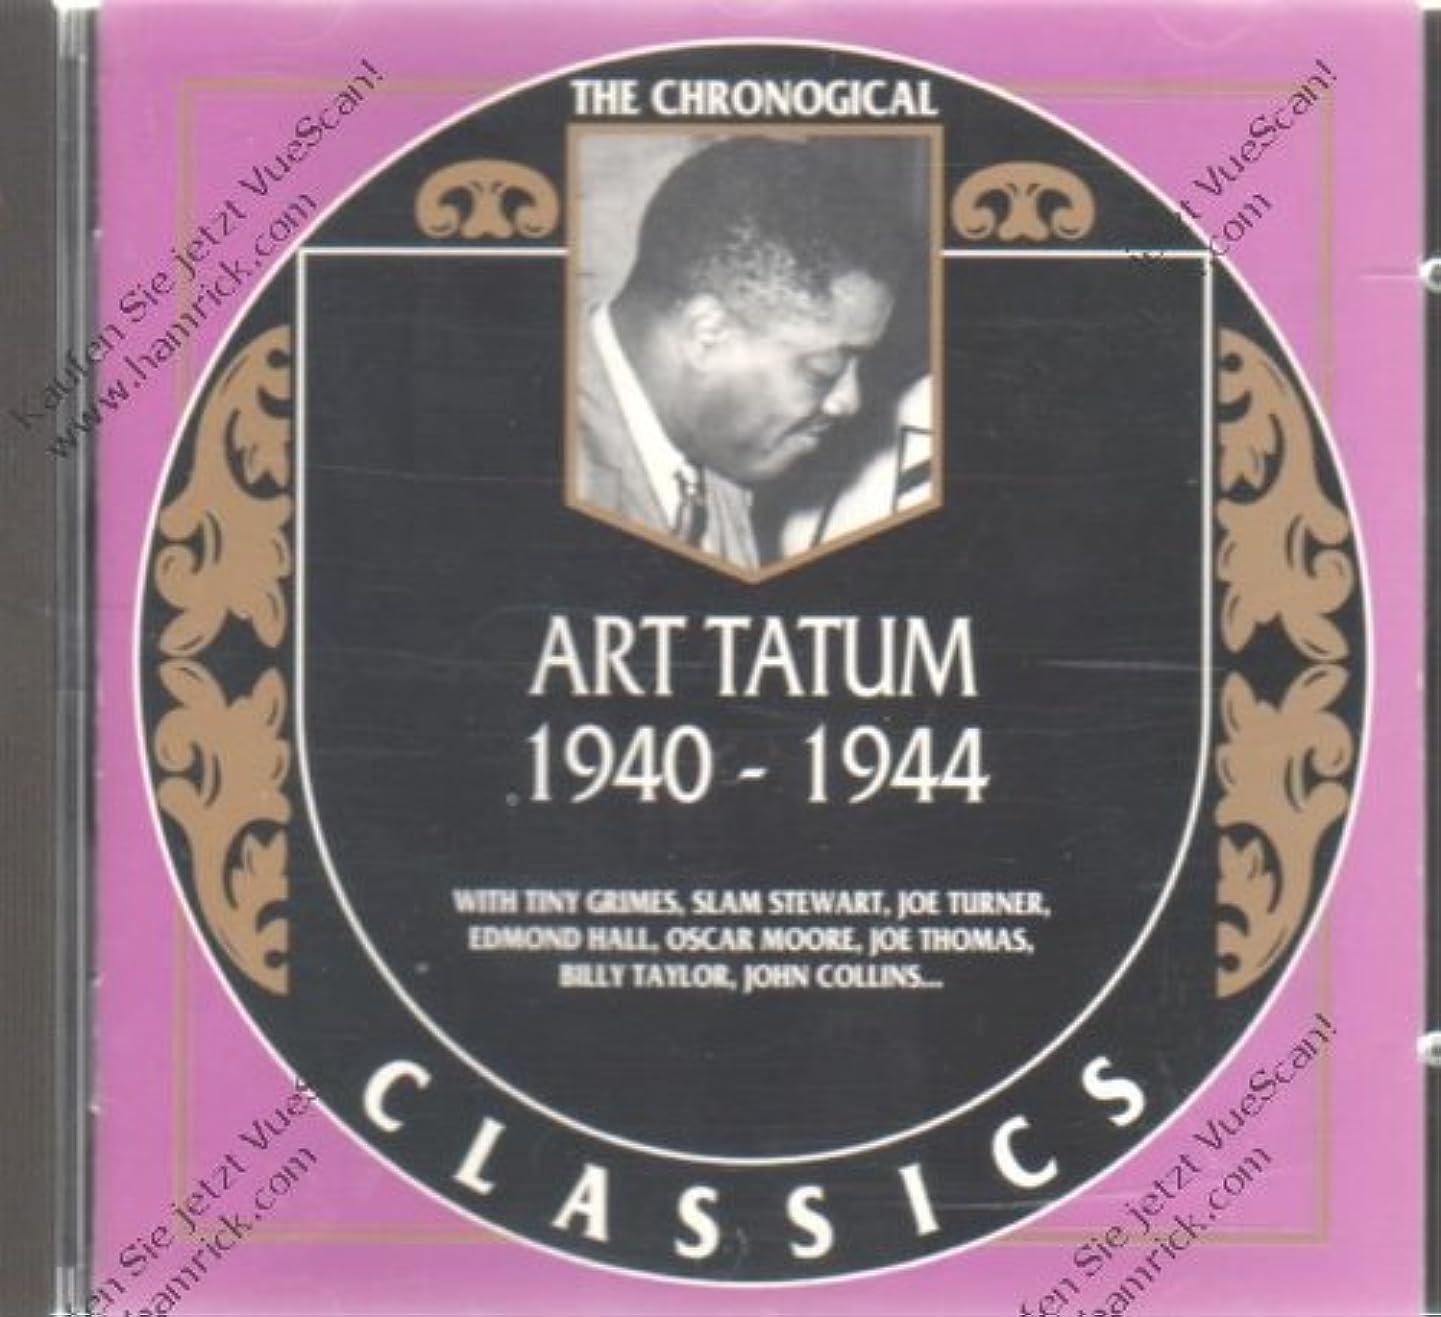 The Chronological Classics: Art Tatum 1940-1944